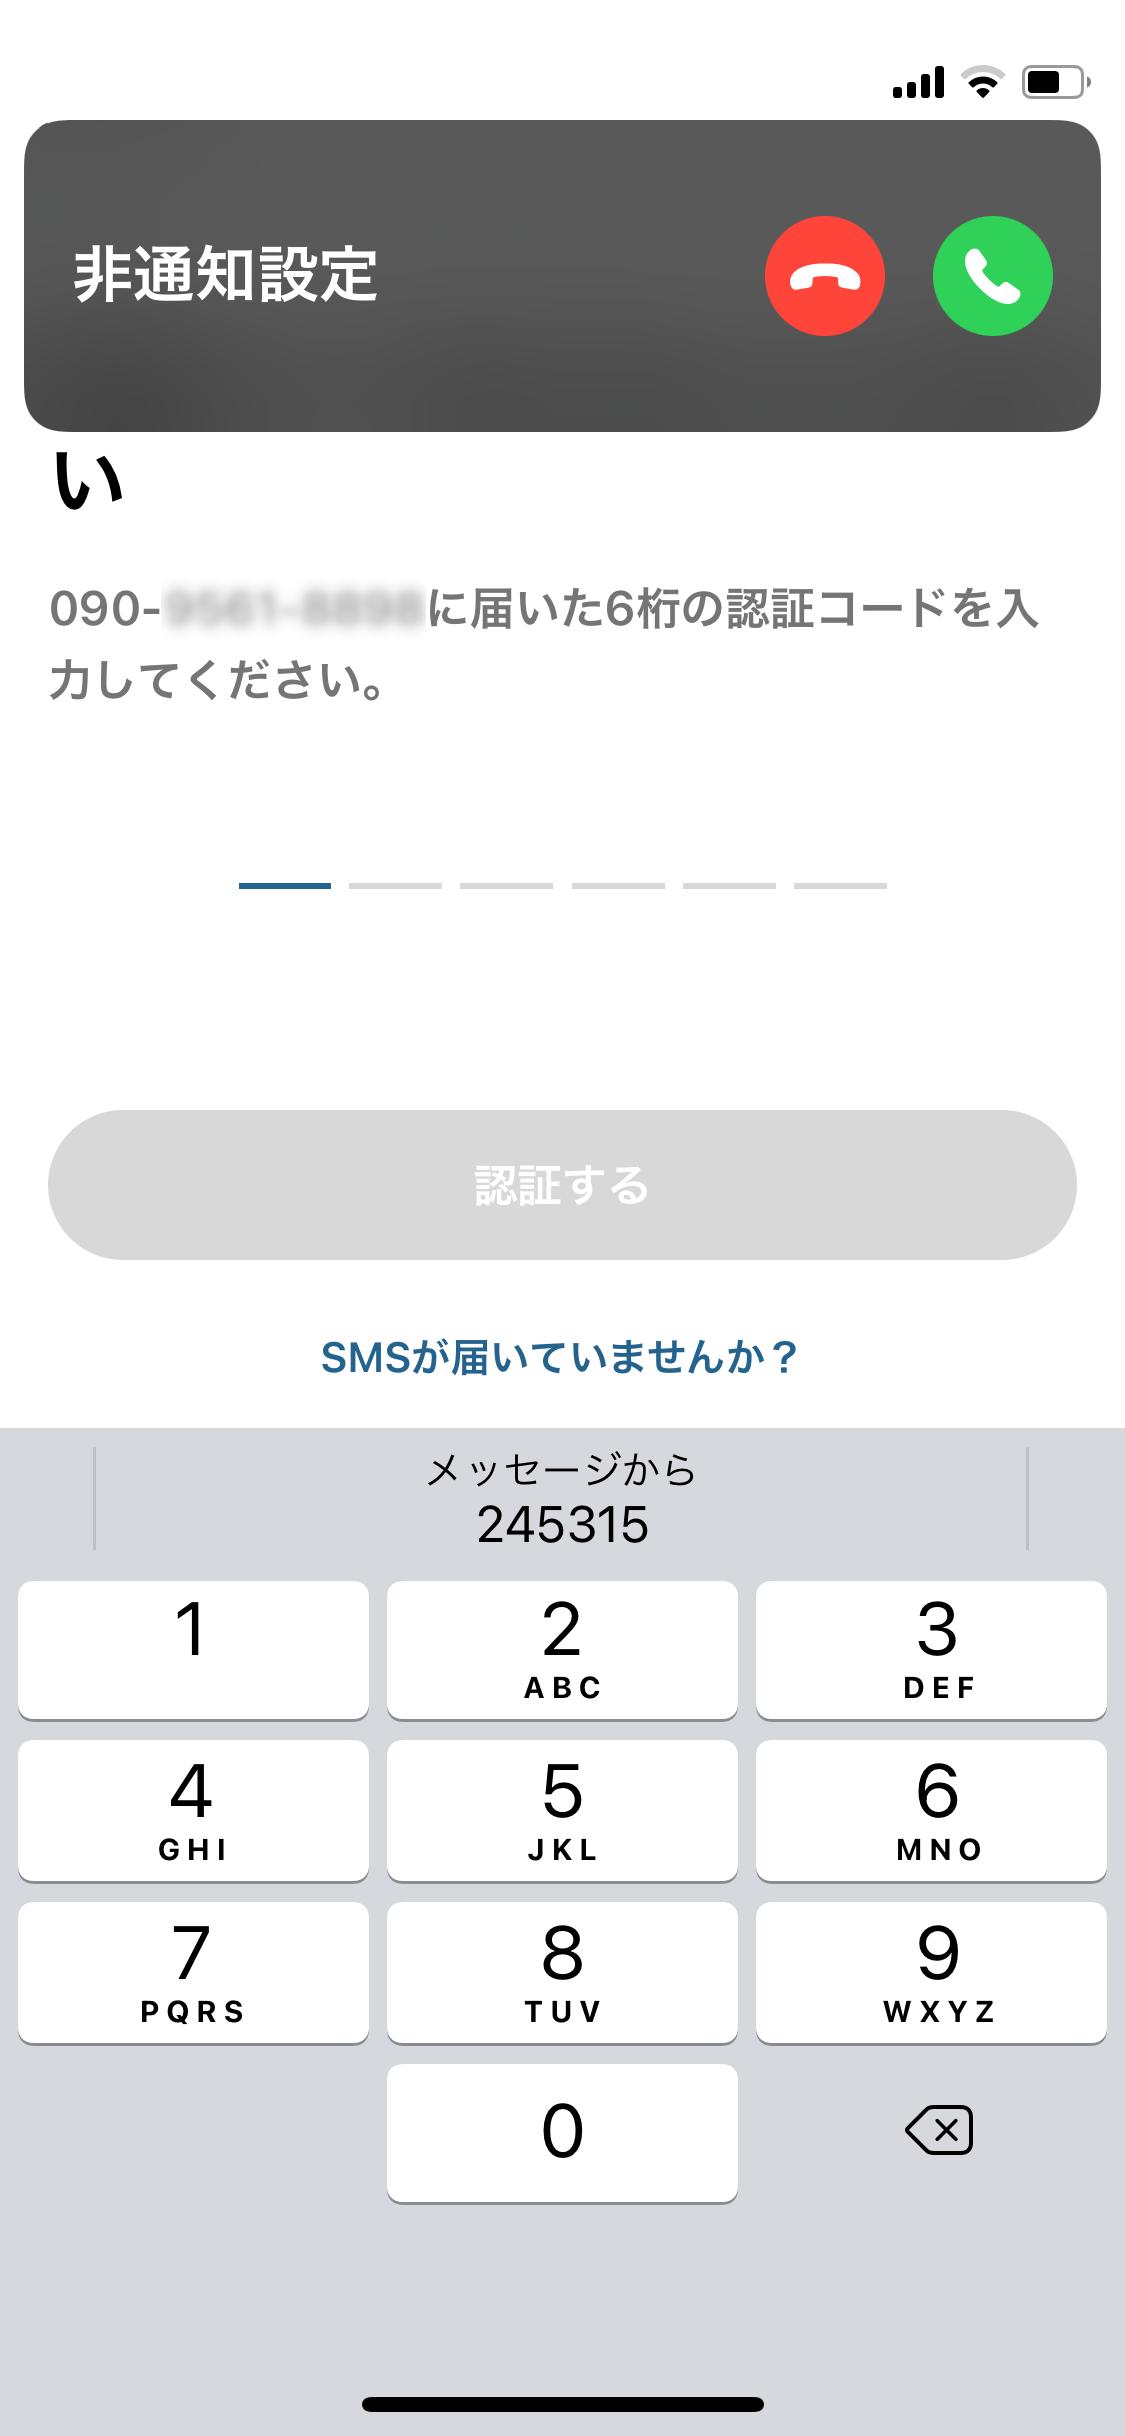 175e533a05b2bb.png